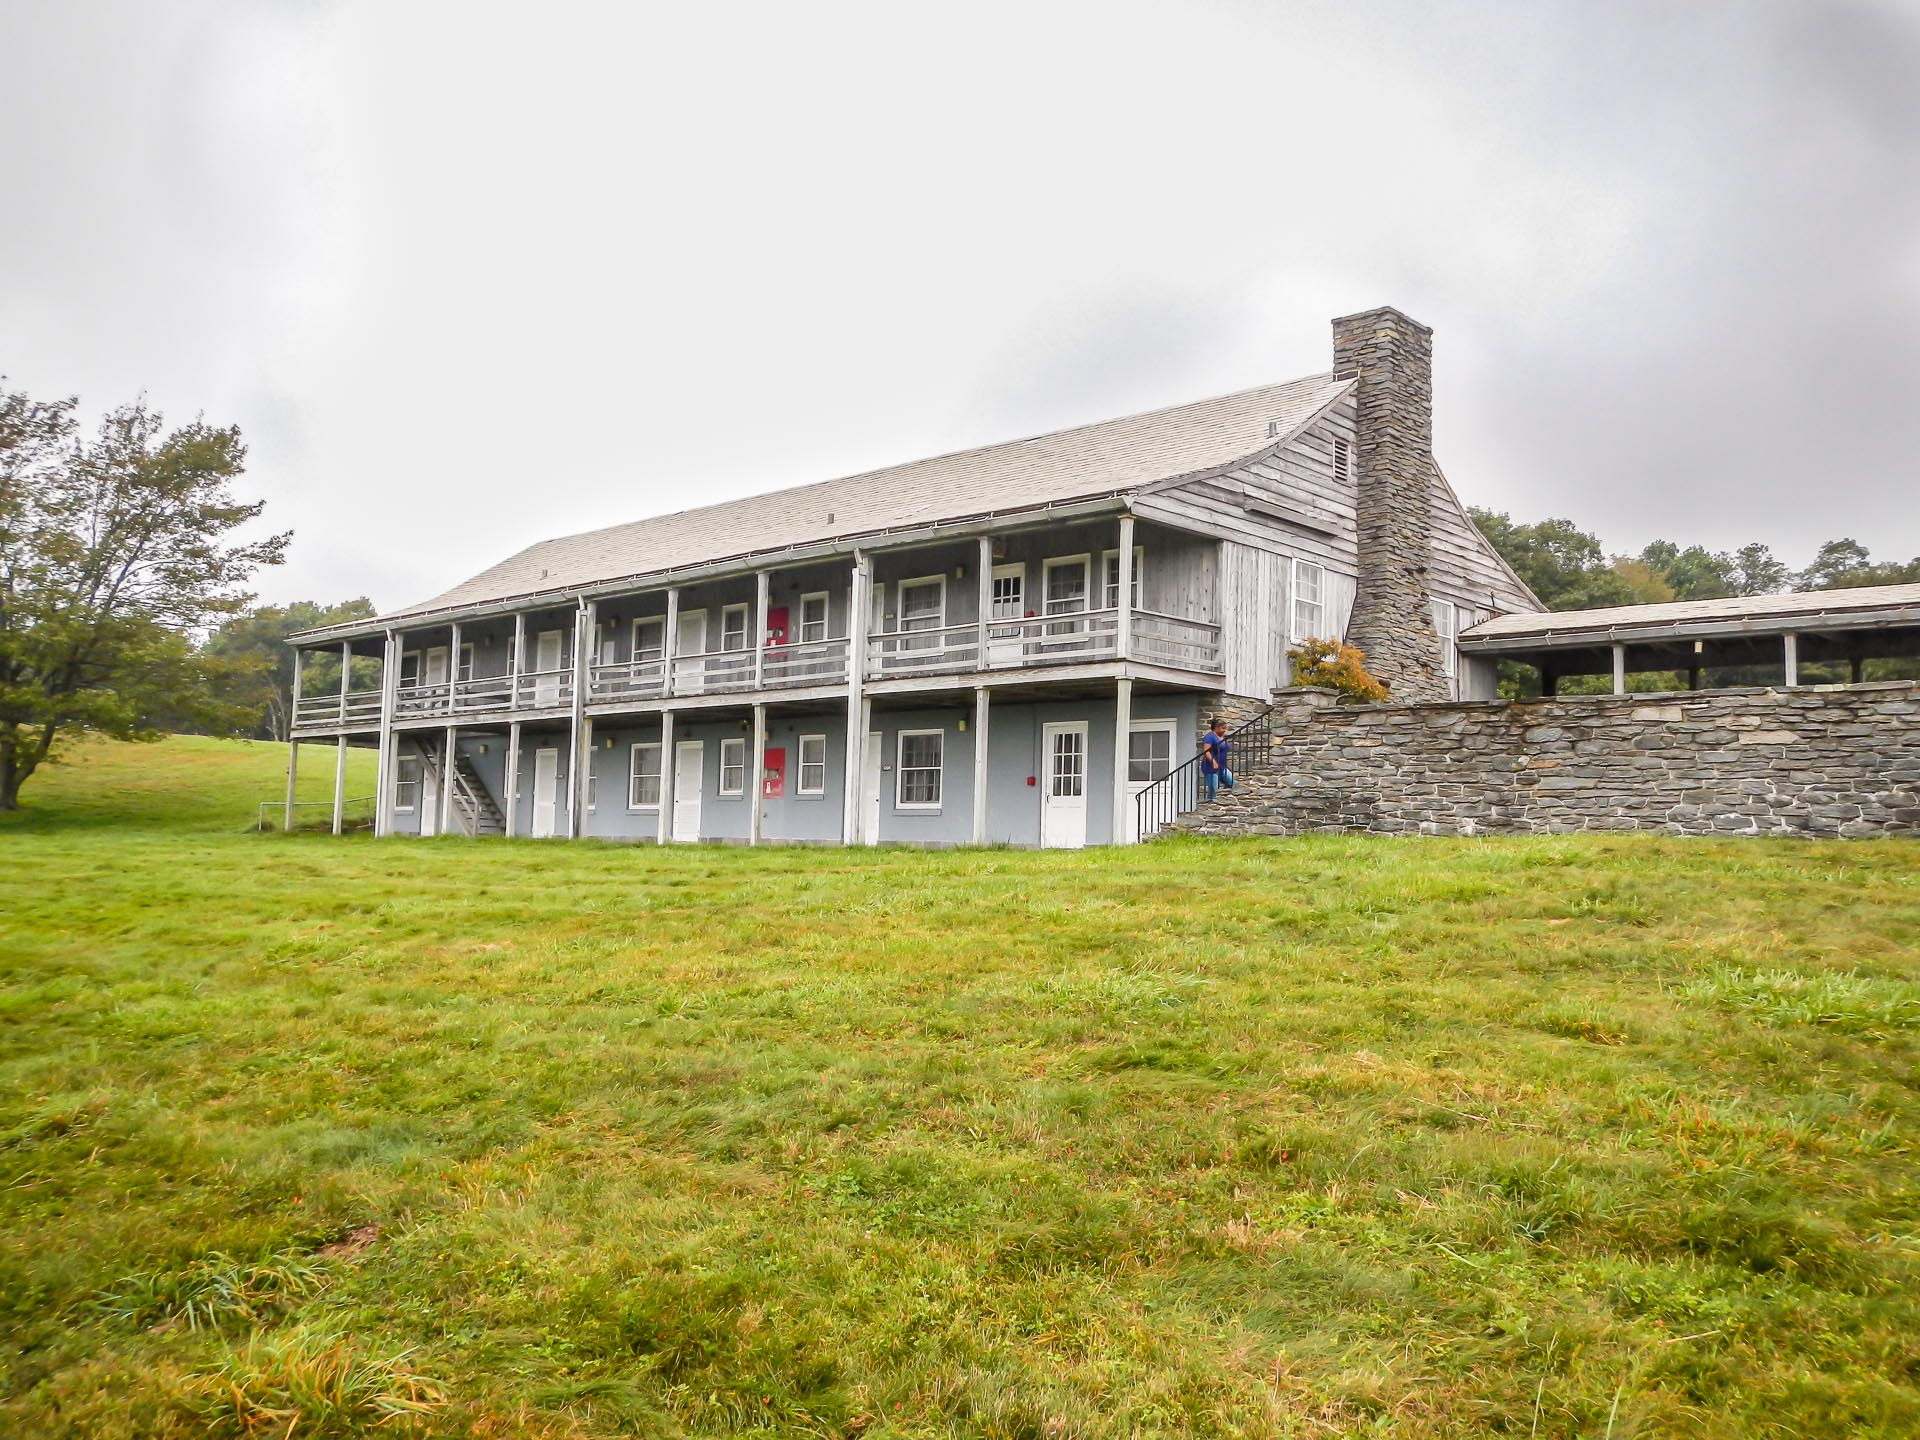 Blue Ridge Parkway Otter Lodge